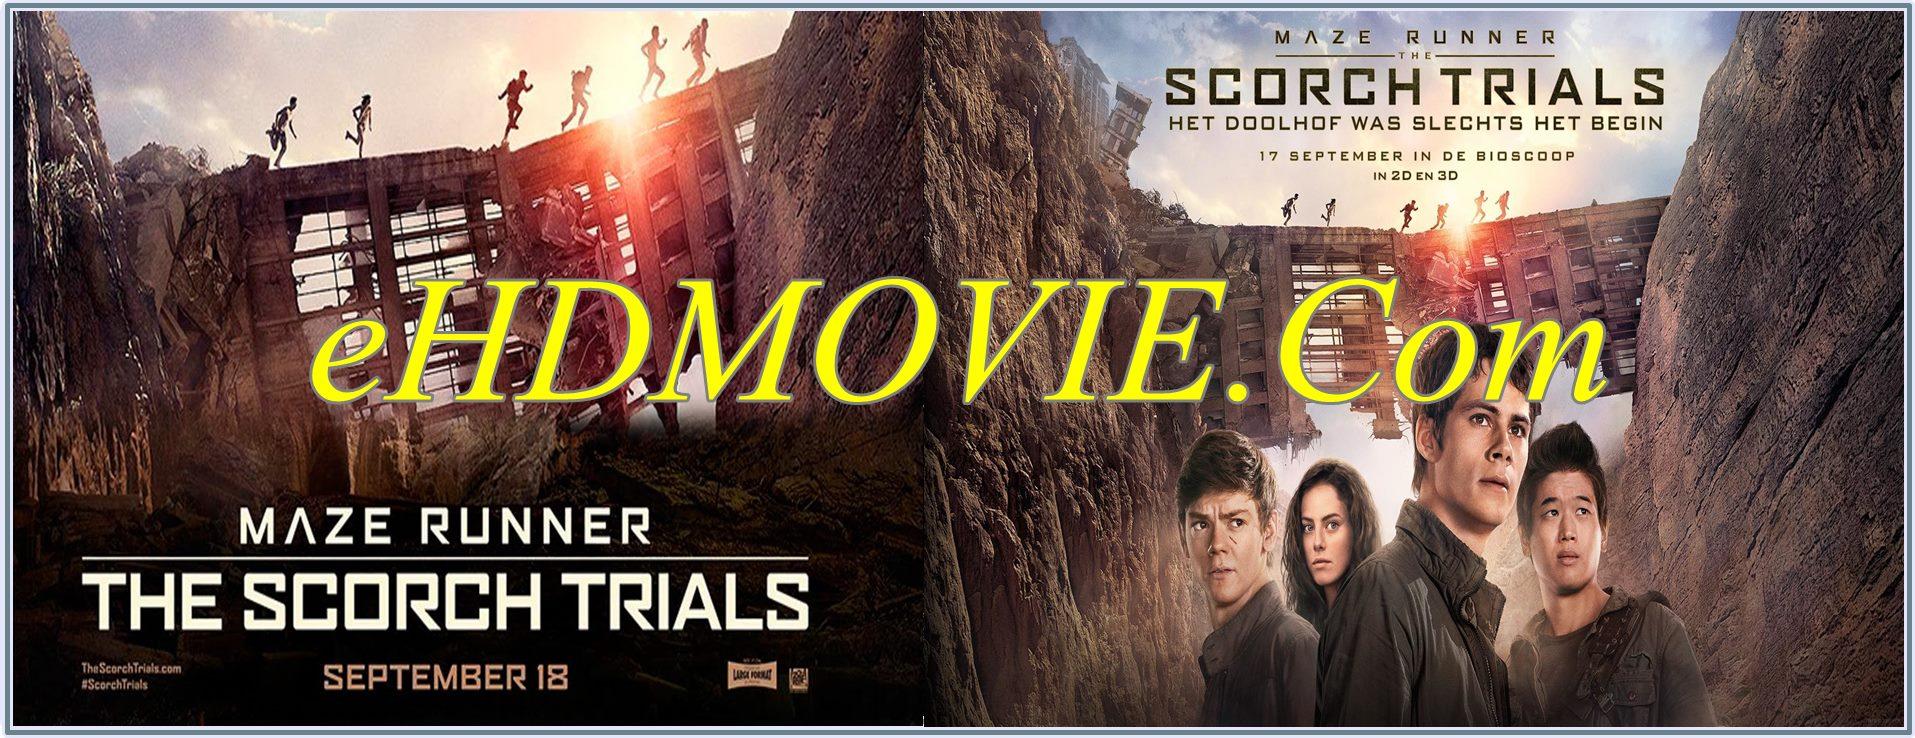 Maze Runner The Scorch Trials 2015 Full Movie Dual Audio [Hindi – English] 720p - 480p ORG BRRip 400MB - 1.4GB ESubs Free Download